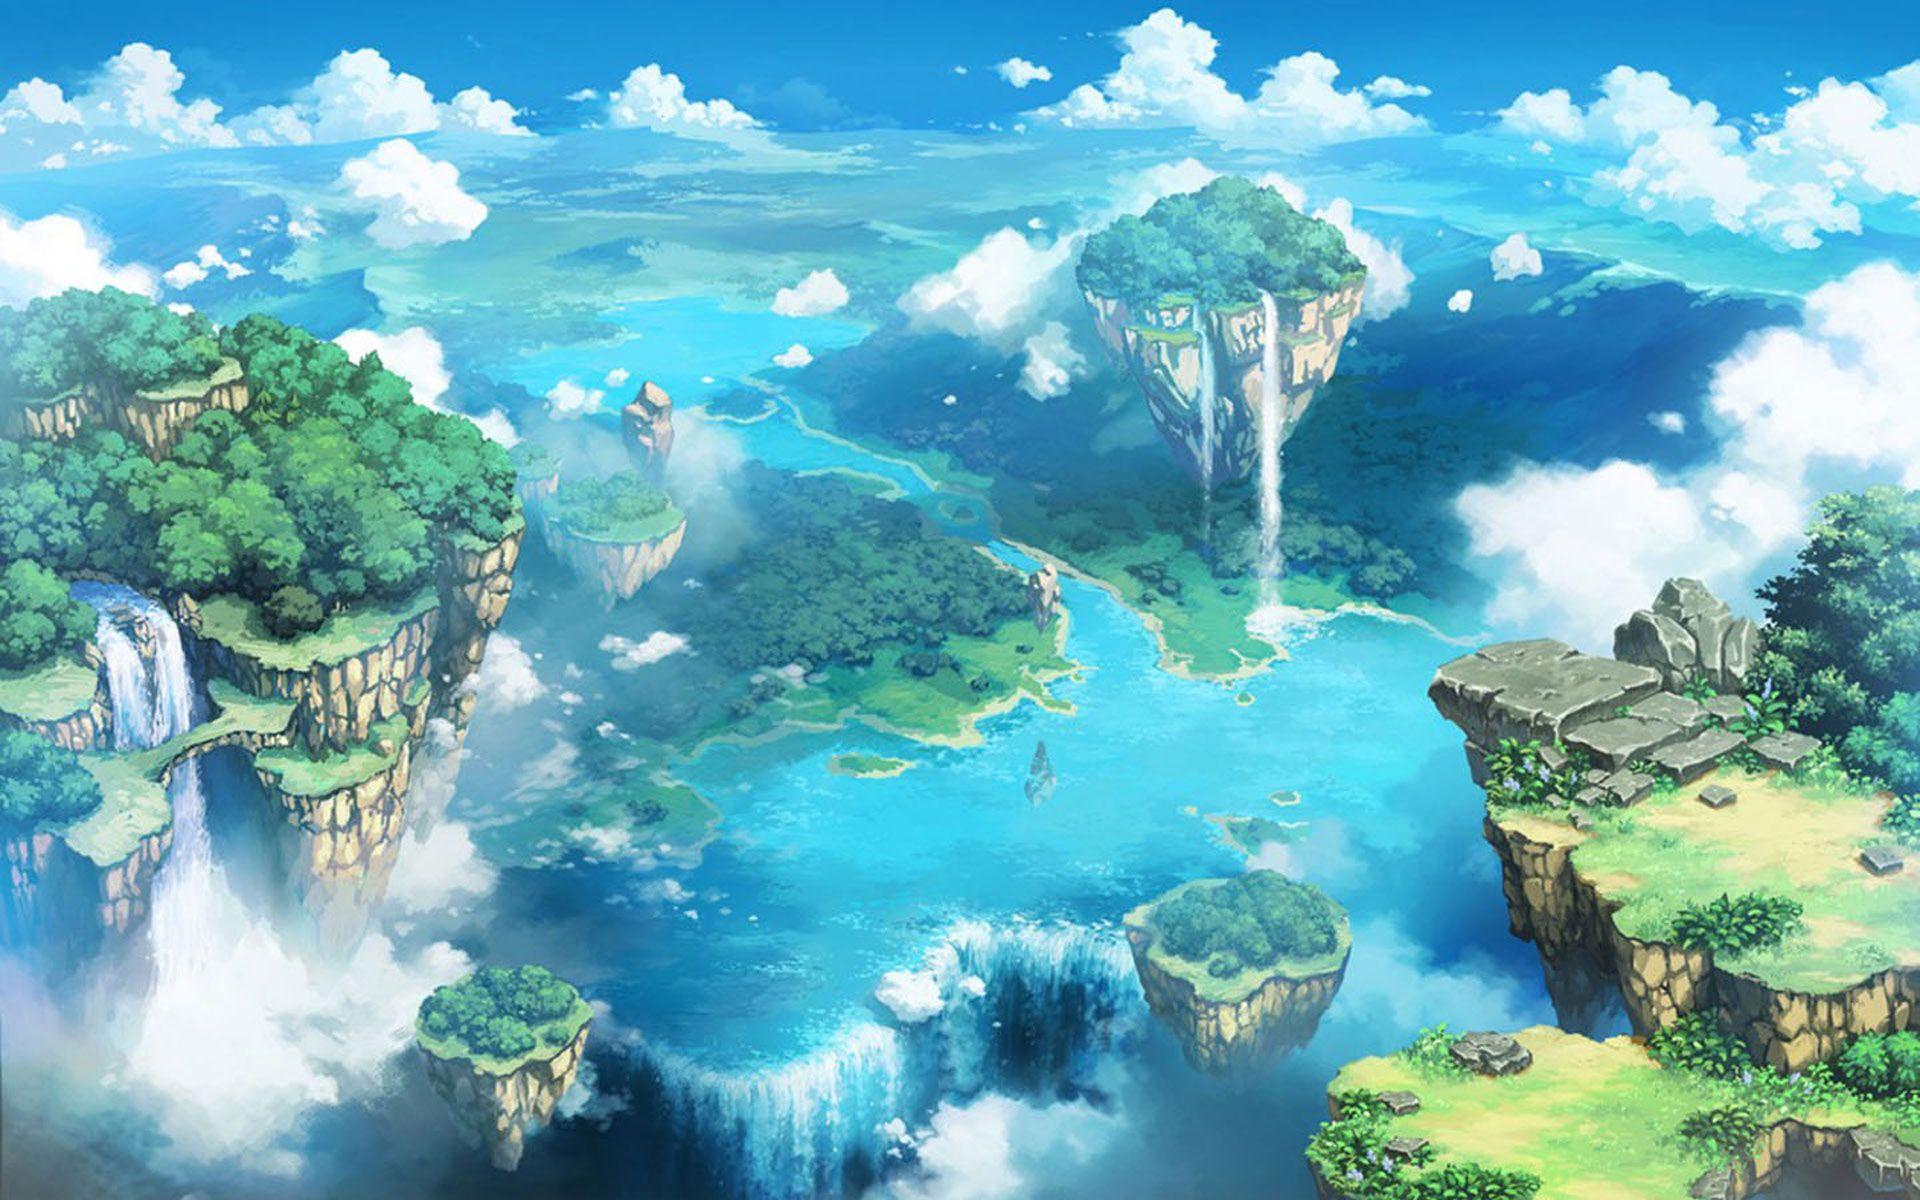 Backgrounds Anime Landscape Download Anime Scenery Wallpaper Anime Scenery Fantasy Landscape